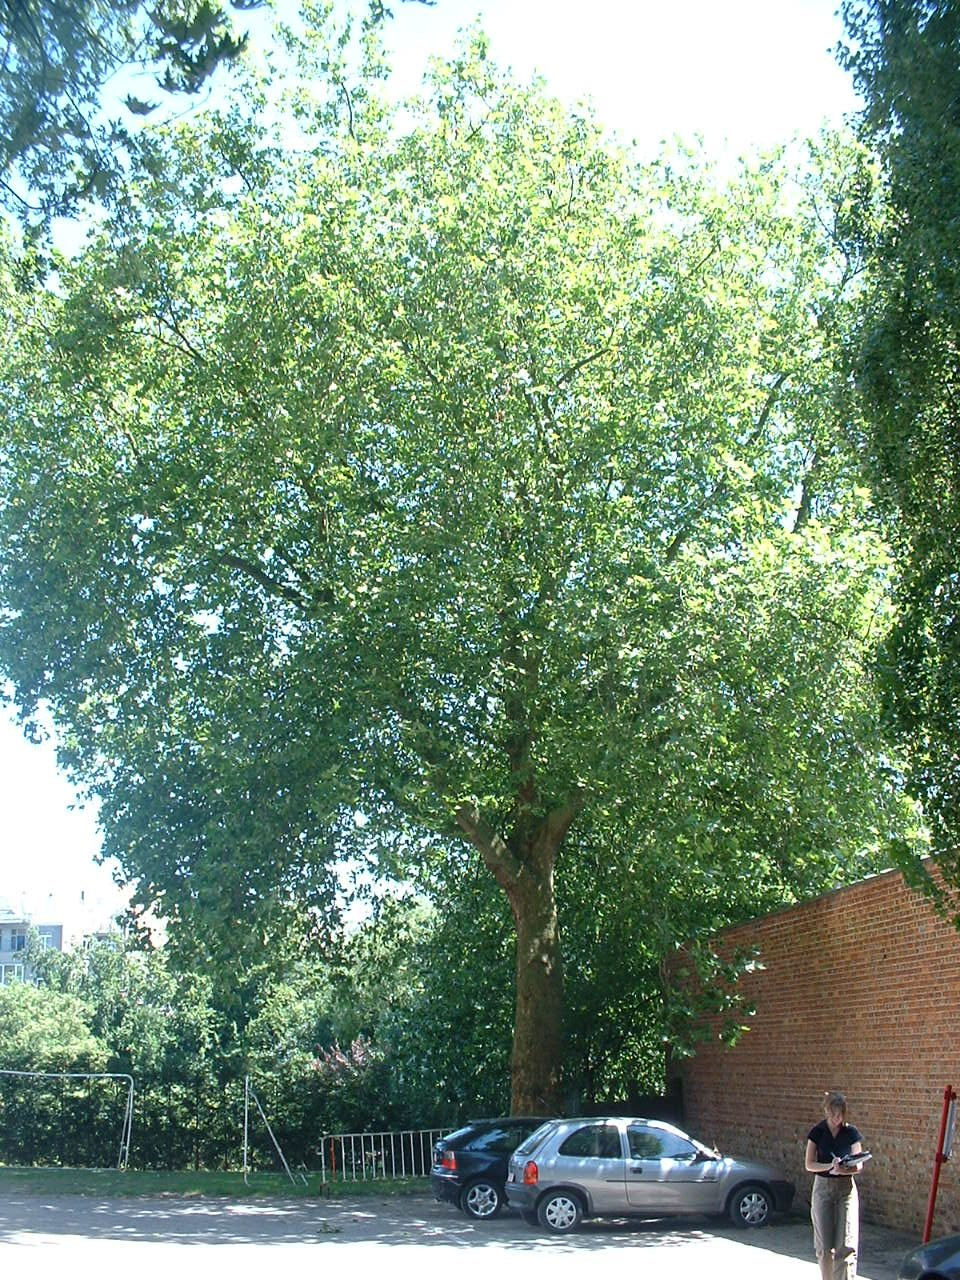 Platane à feuille d'érable – Forest, Rue Roosendael, 175 –  14 Juillet 2006